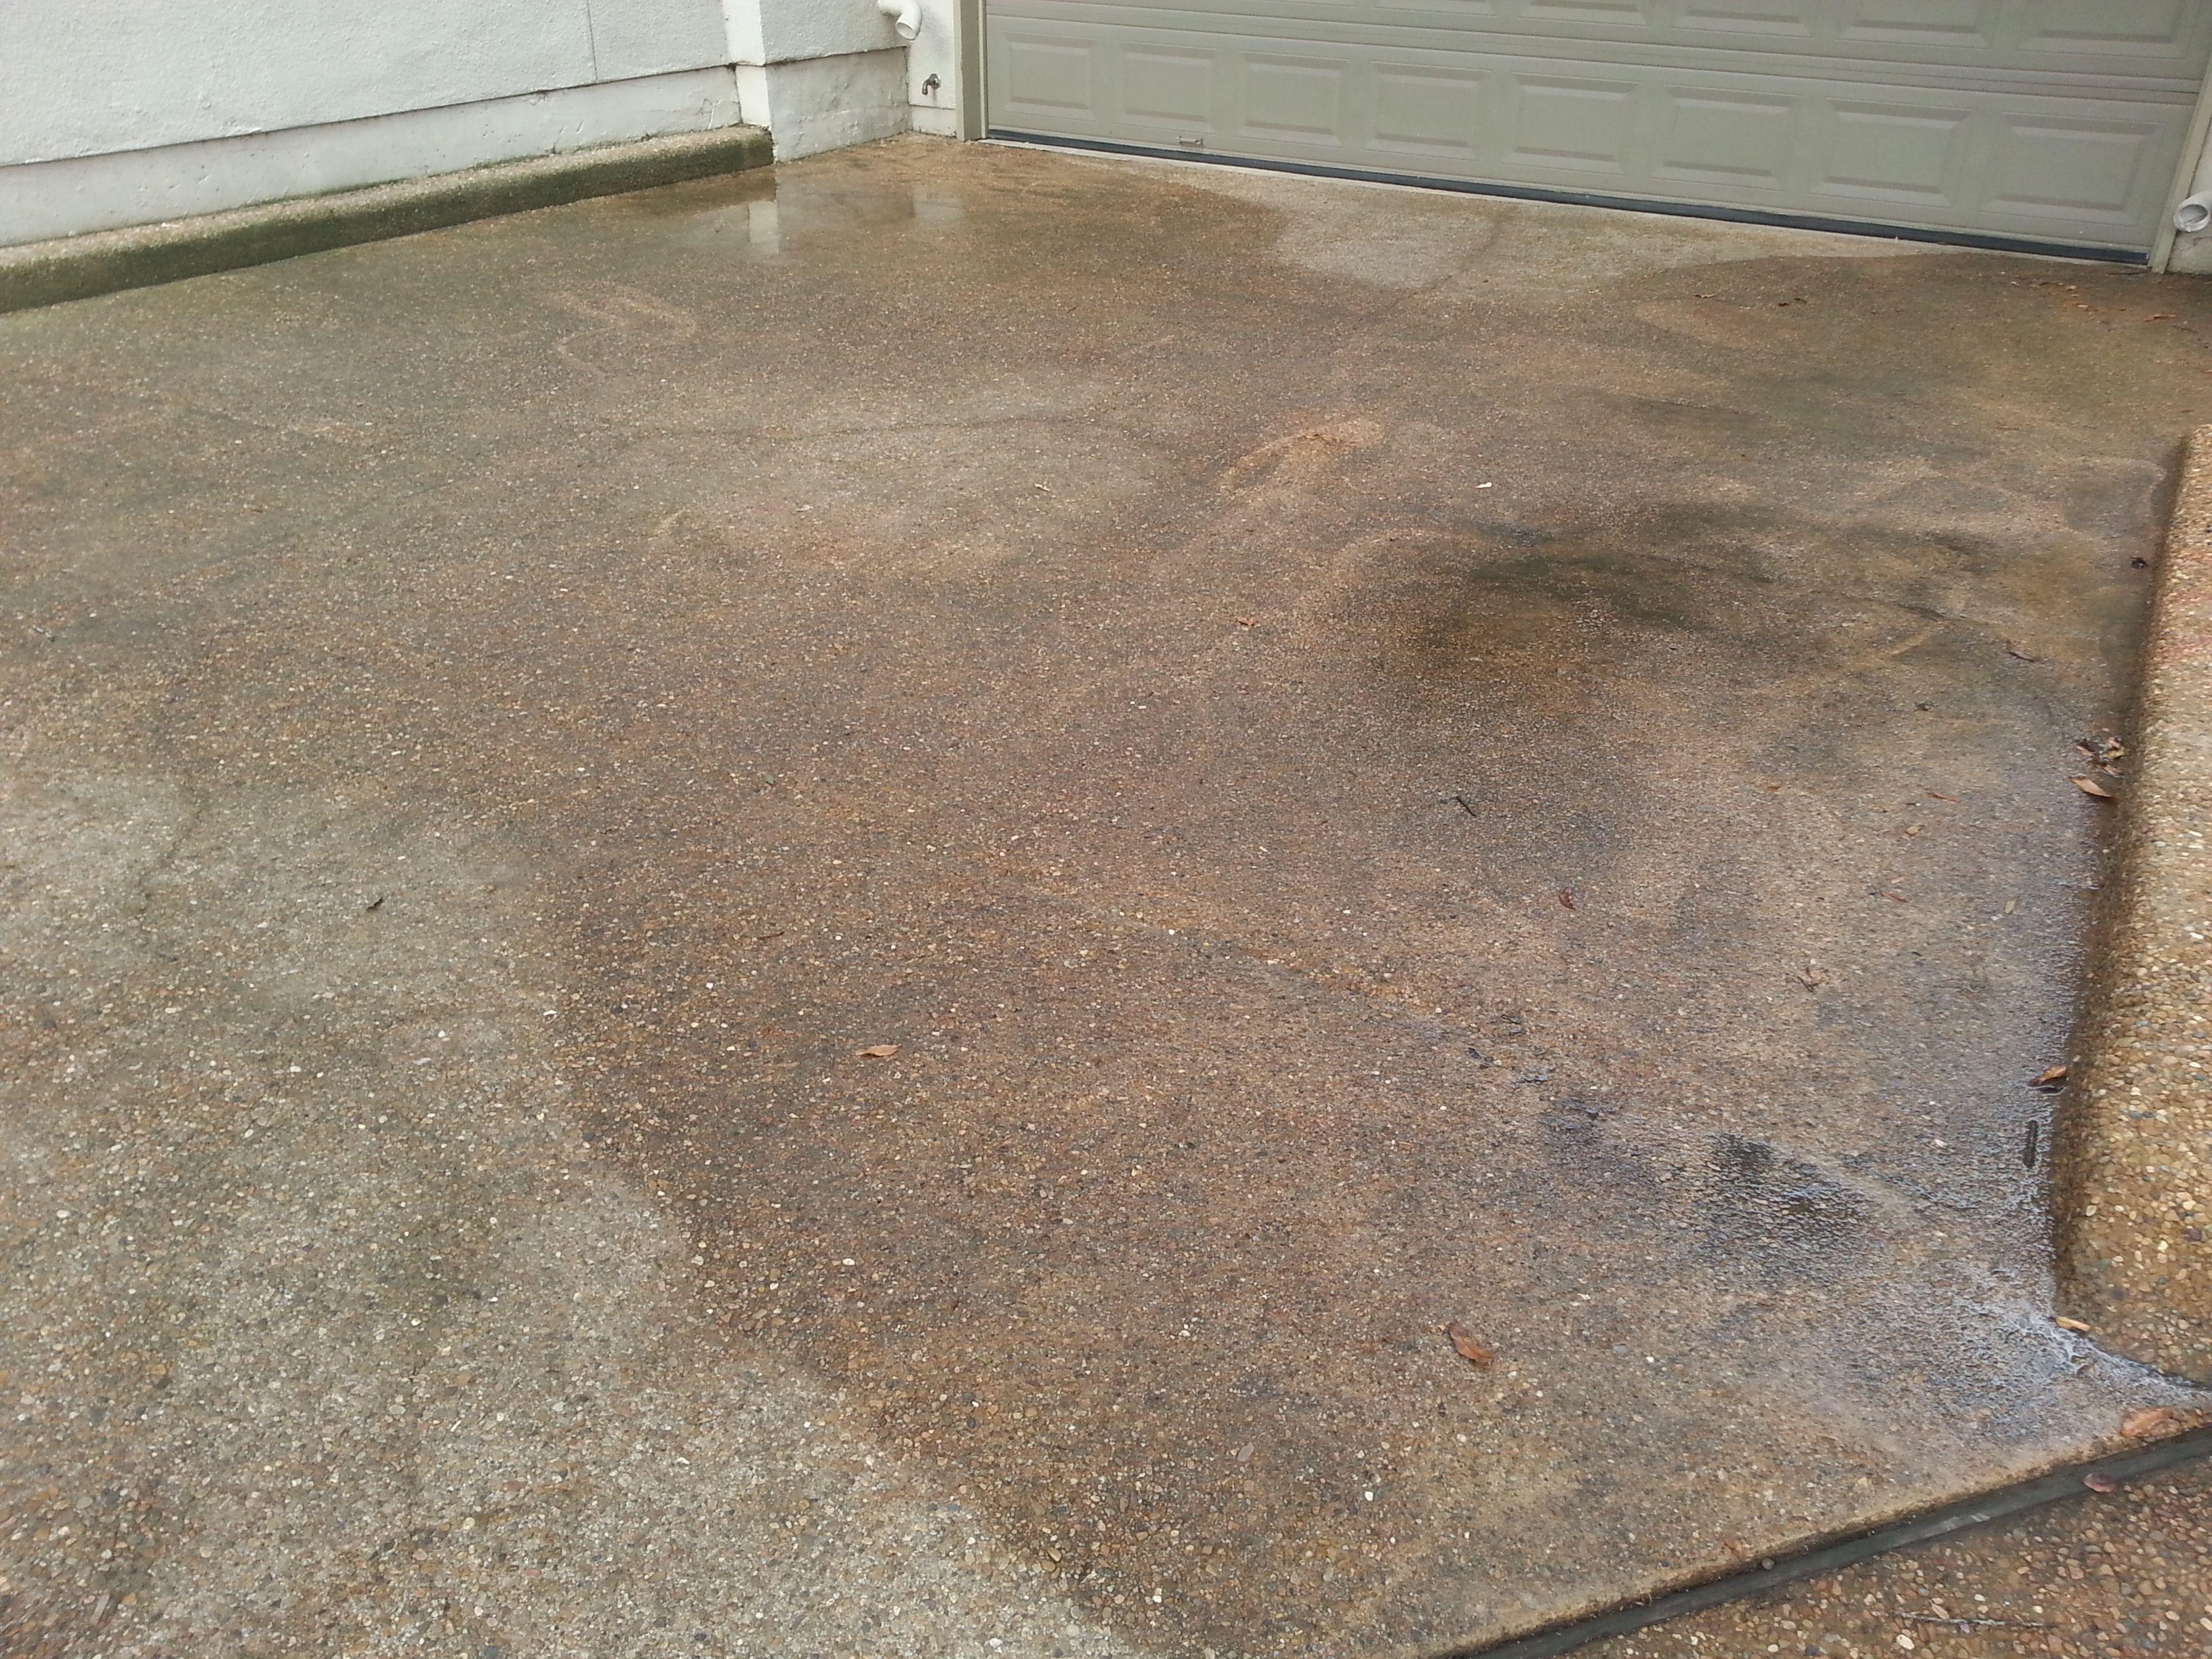 Pressure Washer On Driveway Pressure Washer Clean Concrete Washer